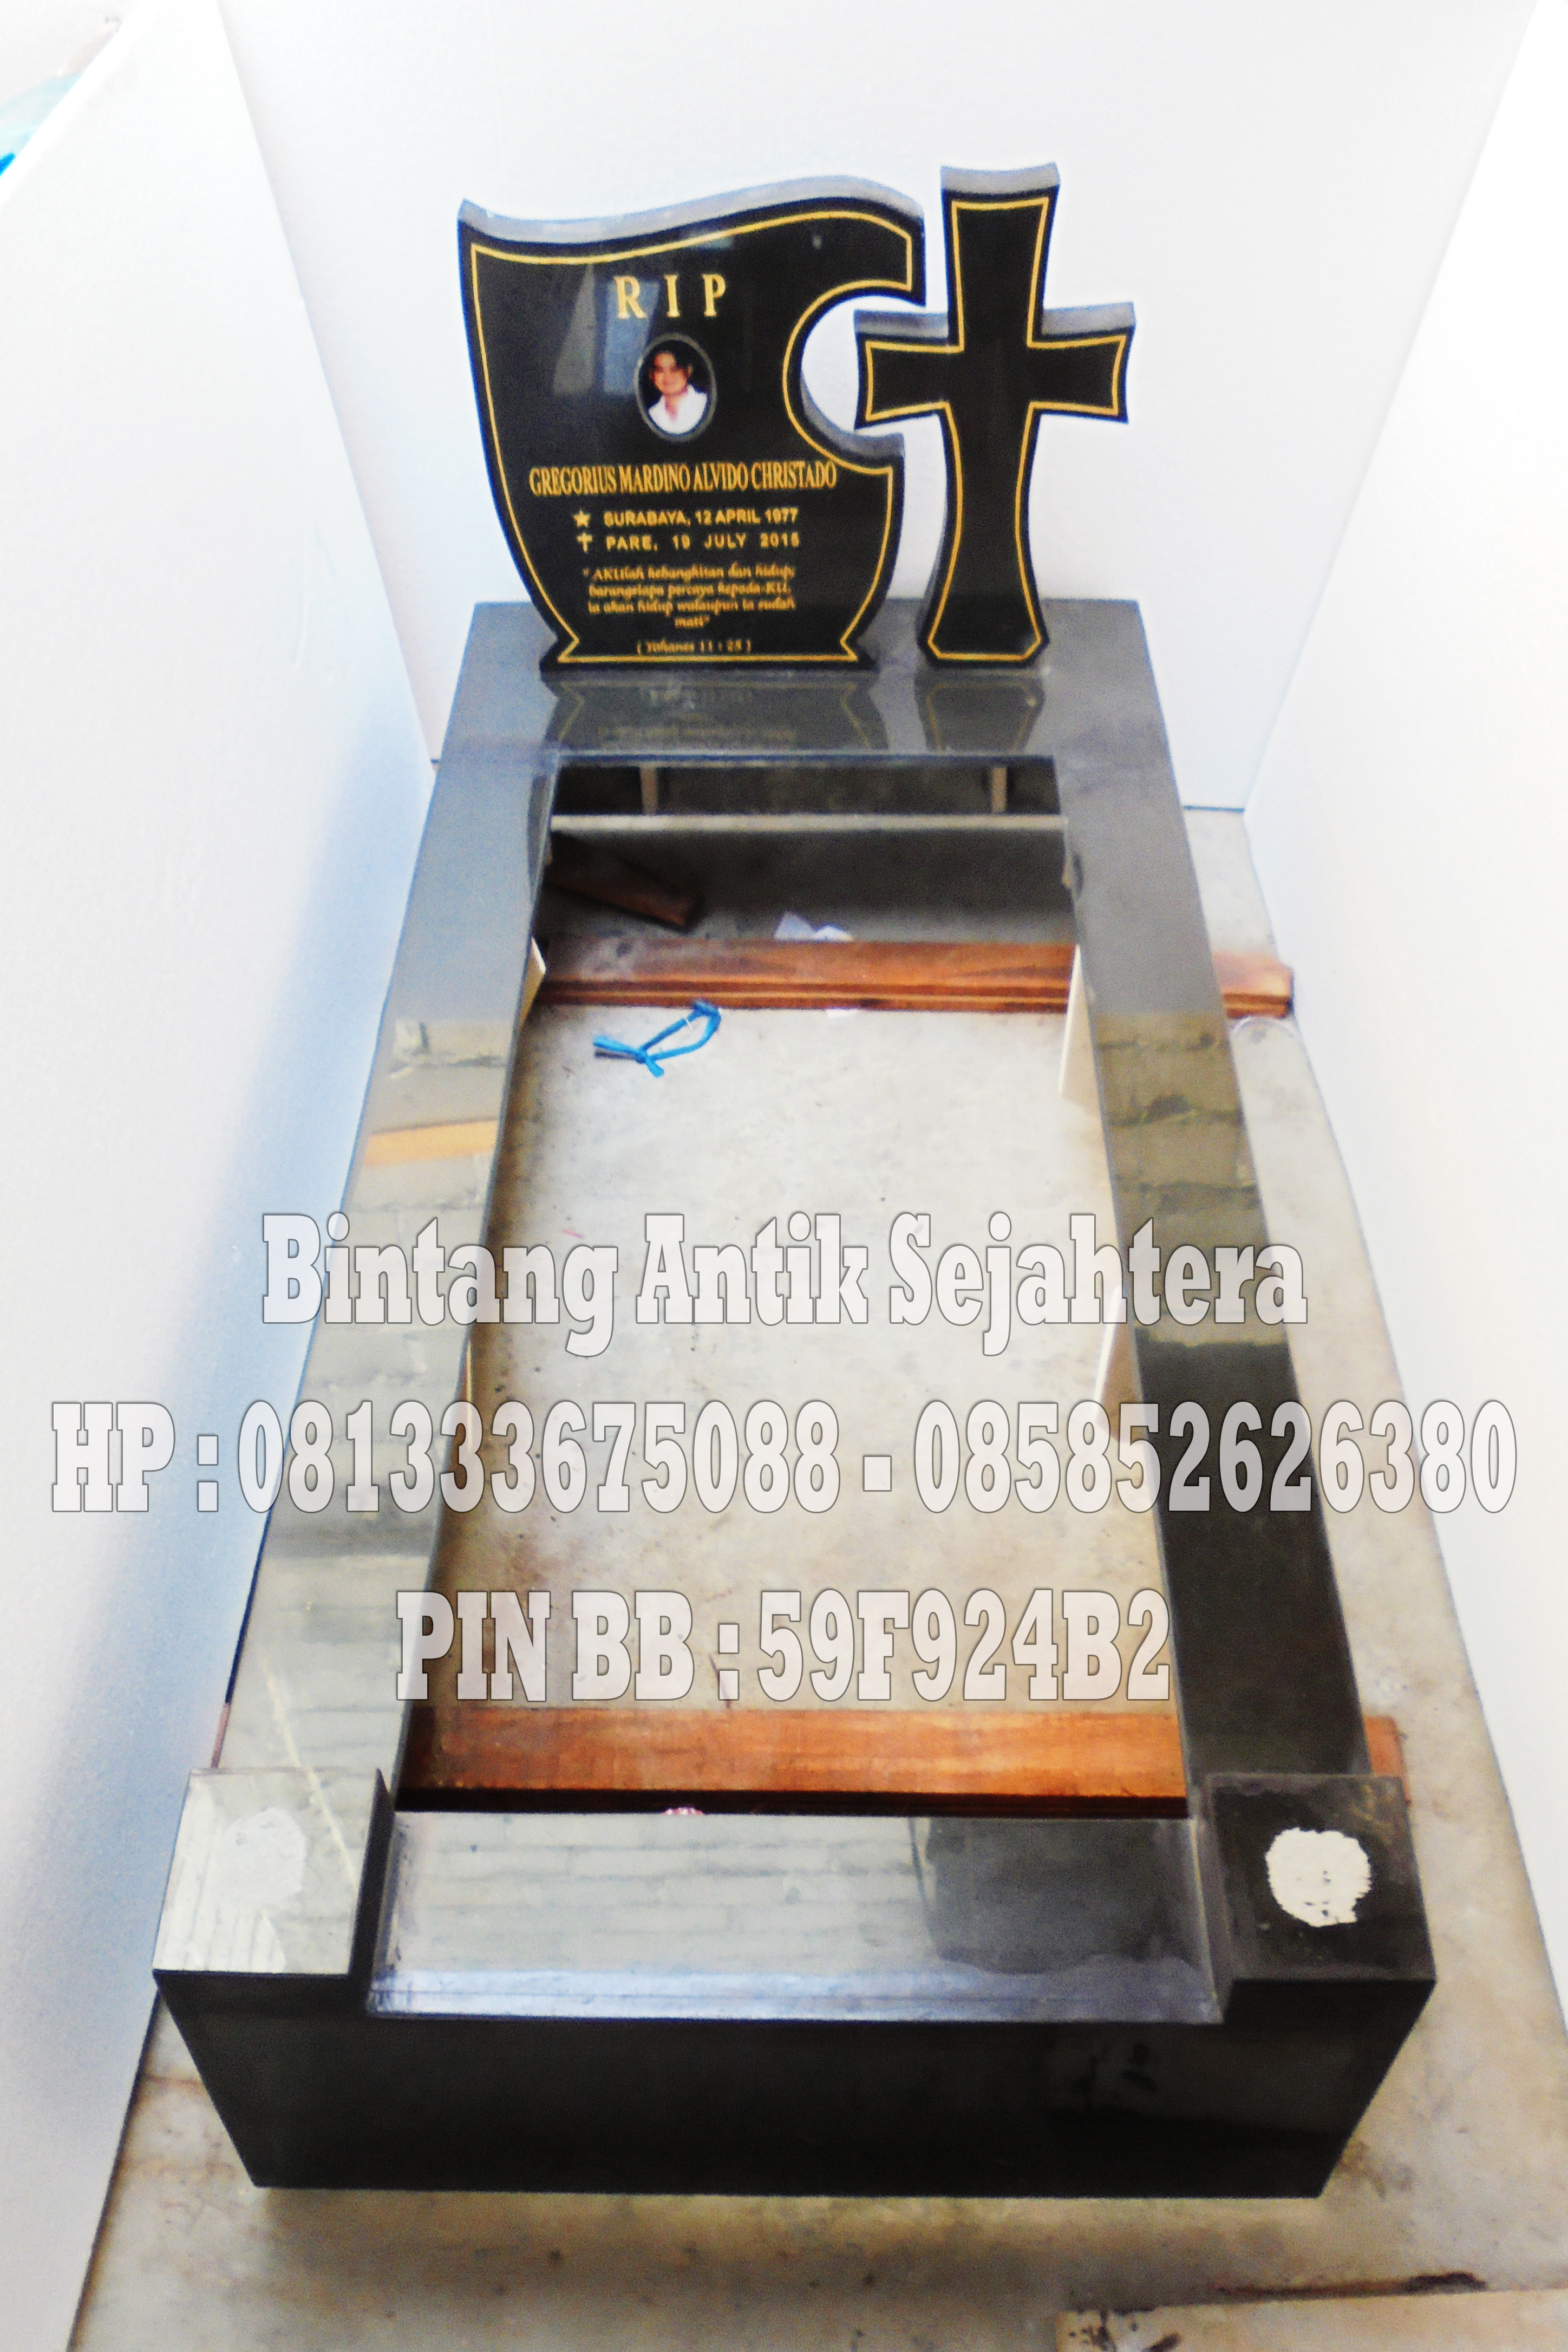 Makam Minimalis, Makam Kristen Granit